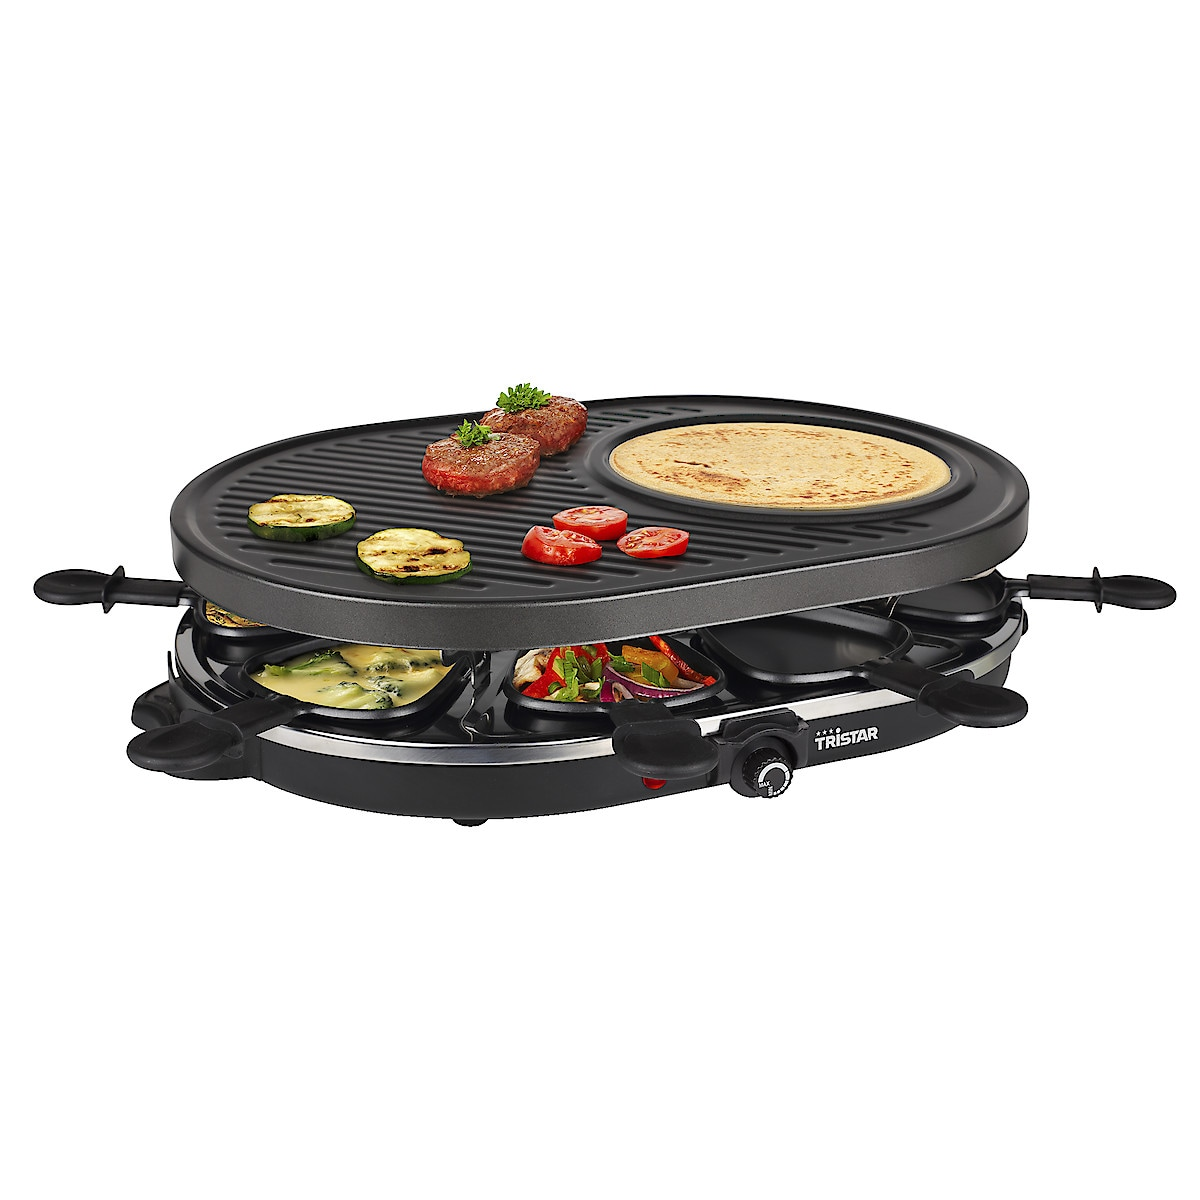 Raclette & Crepe Tristar RA 2996   Clas Ohlson